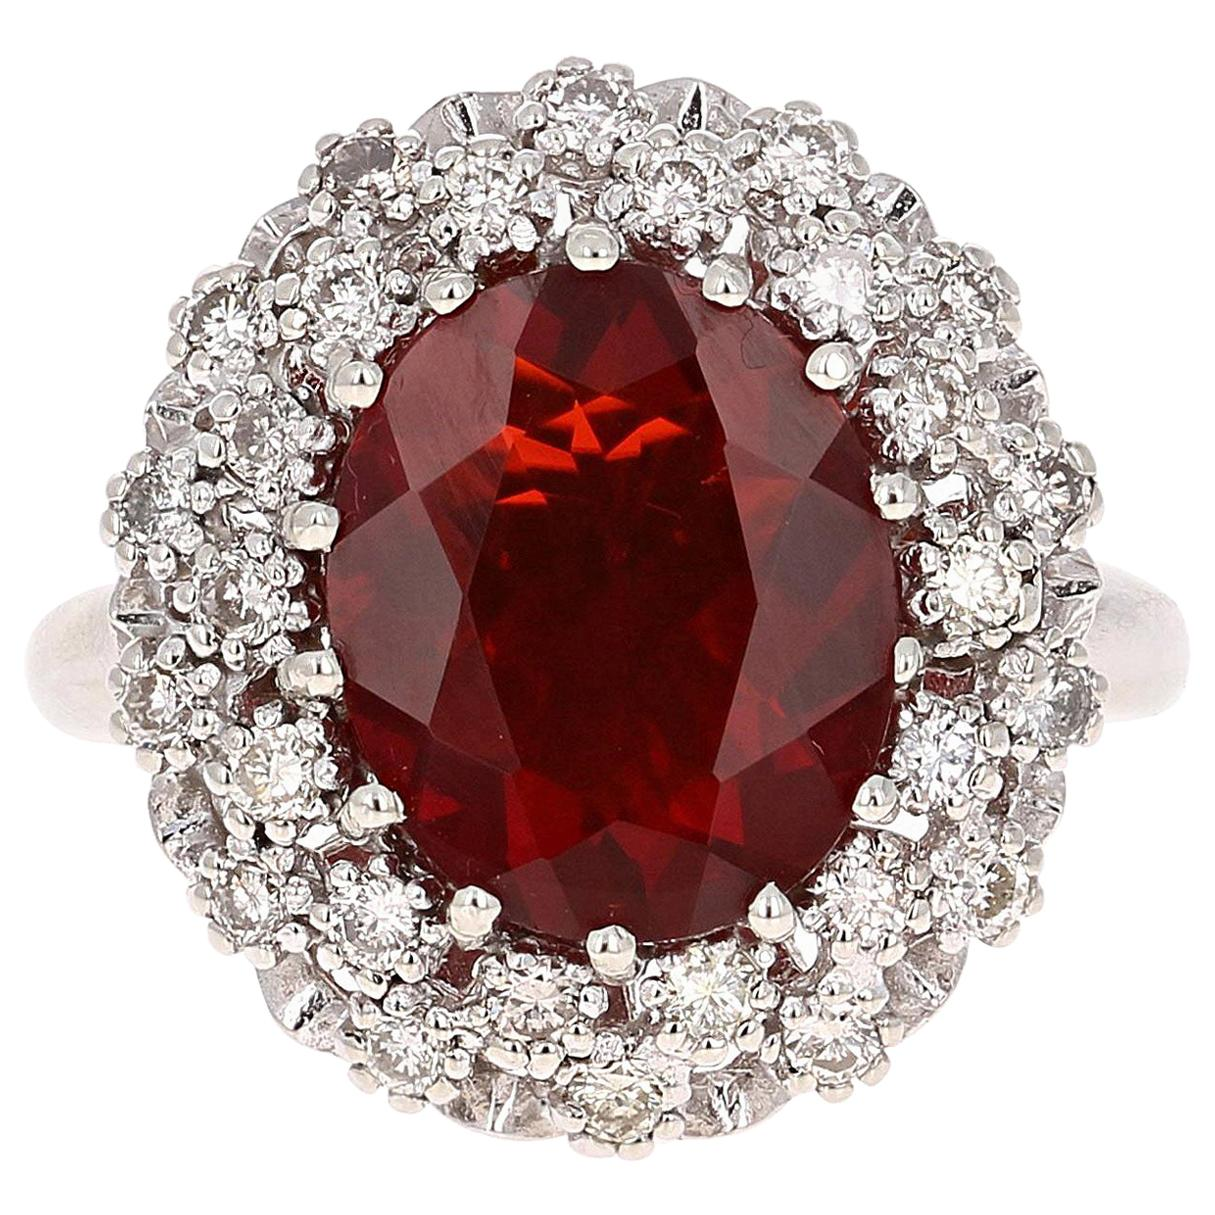 3.27 Carat Fire Opal Diamond 14 Karat White Gold Ring